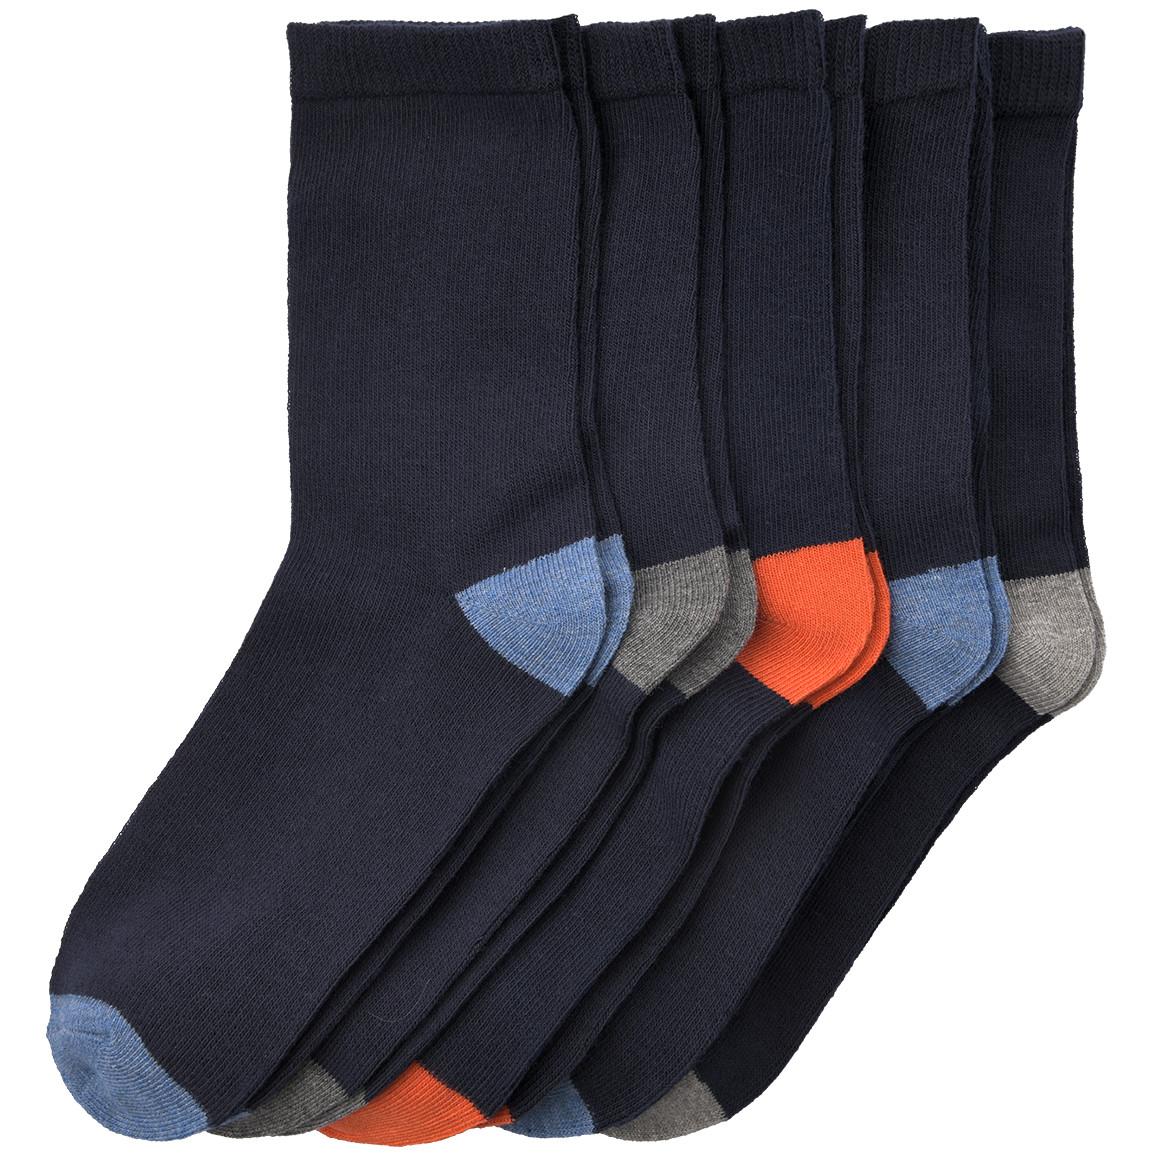 Miniboyaccessoires - 5 Paar Jungen Socken im Set - Onlineshop Ernstings family